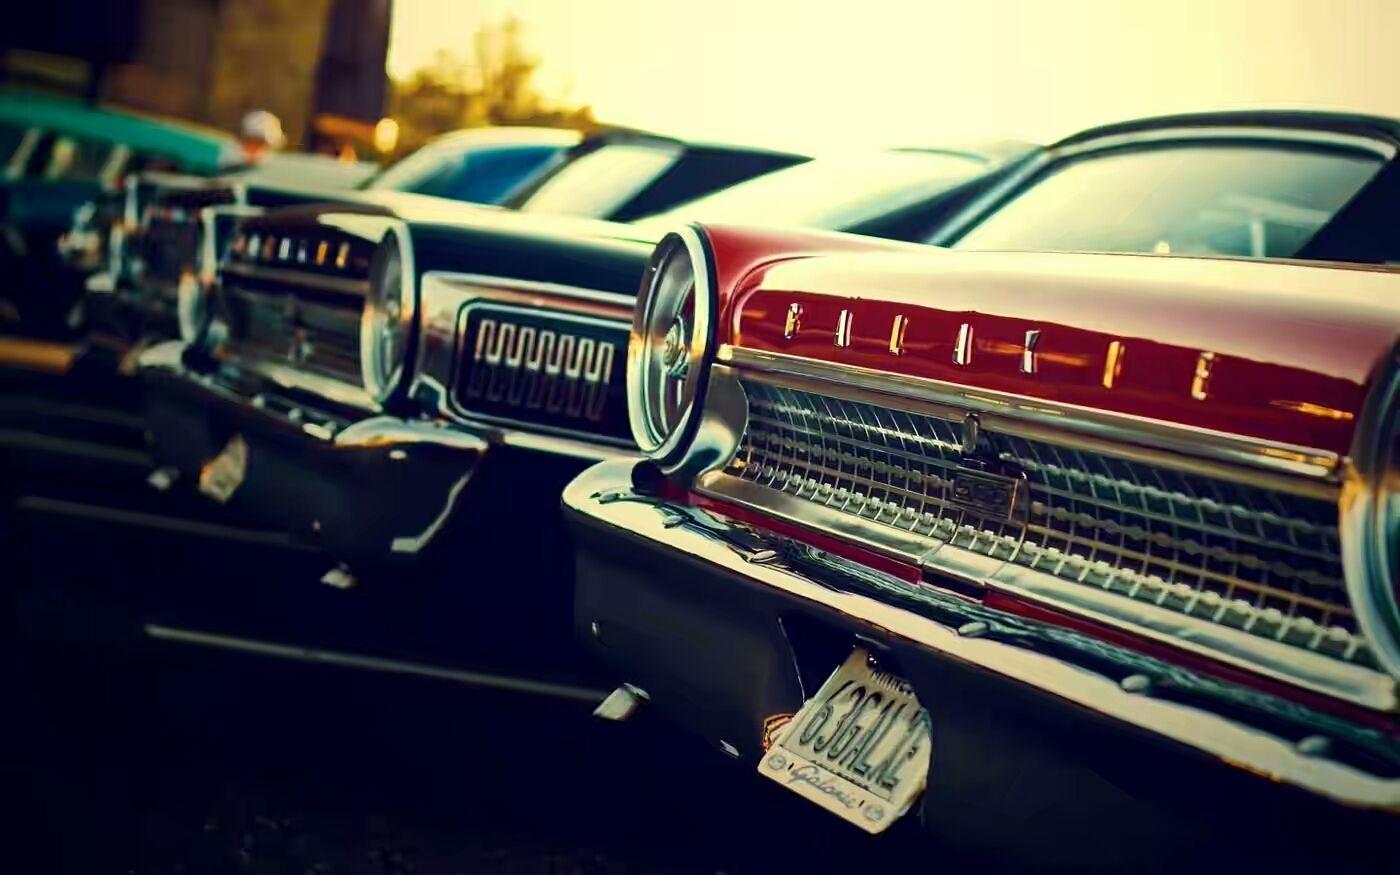 Auto Restoration For Your Classic Car Car Wallpapers Hd Wallpapers Of Cars Classic Cars